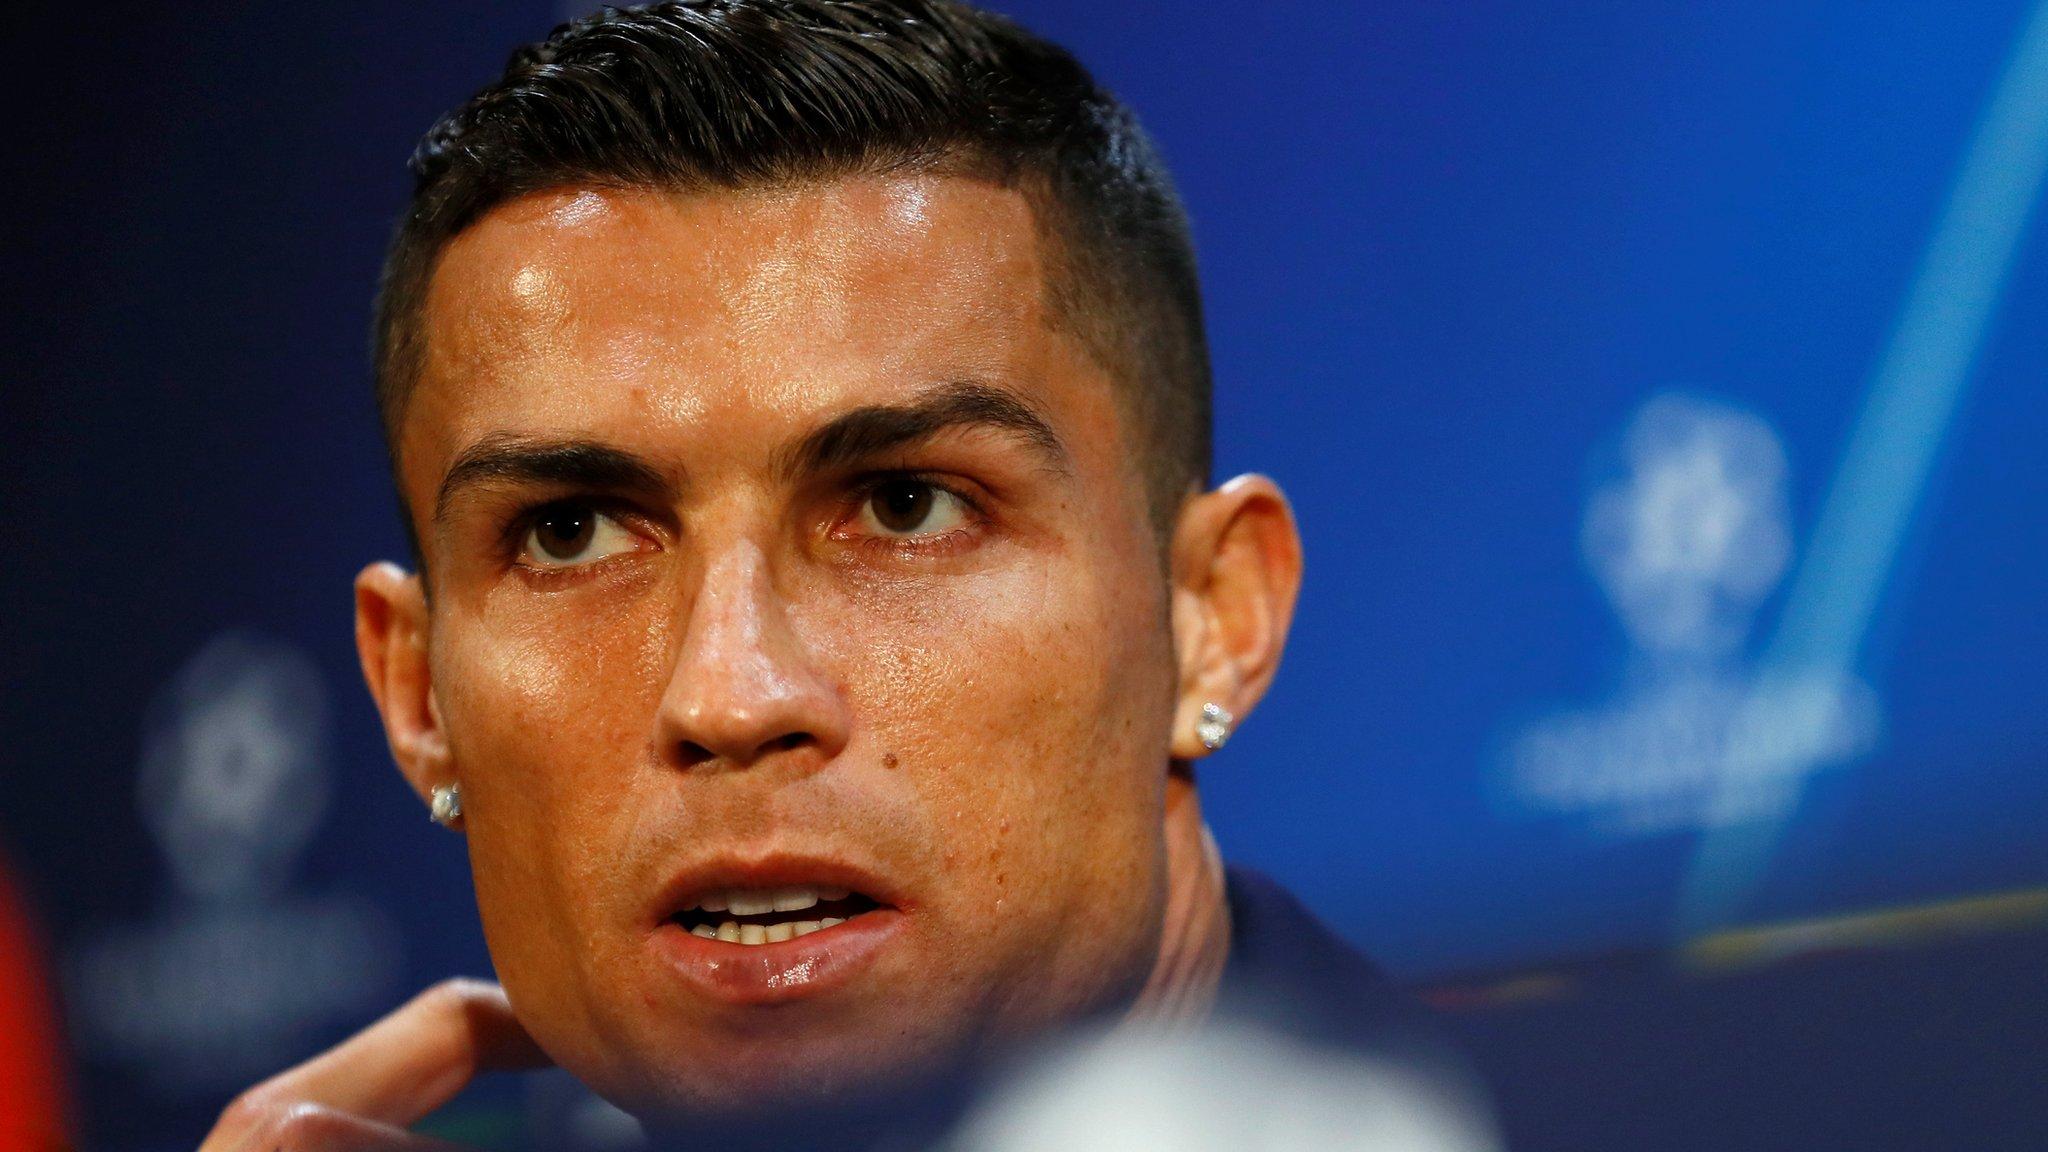 Cristiano Ronaldo rape allegation: Juventus forward says 'lawyers confident'